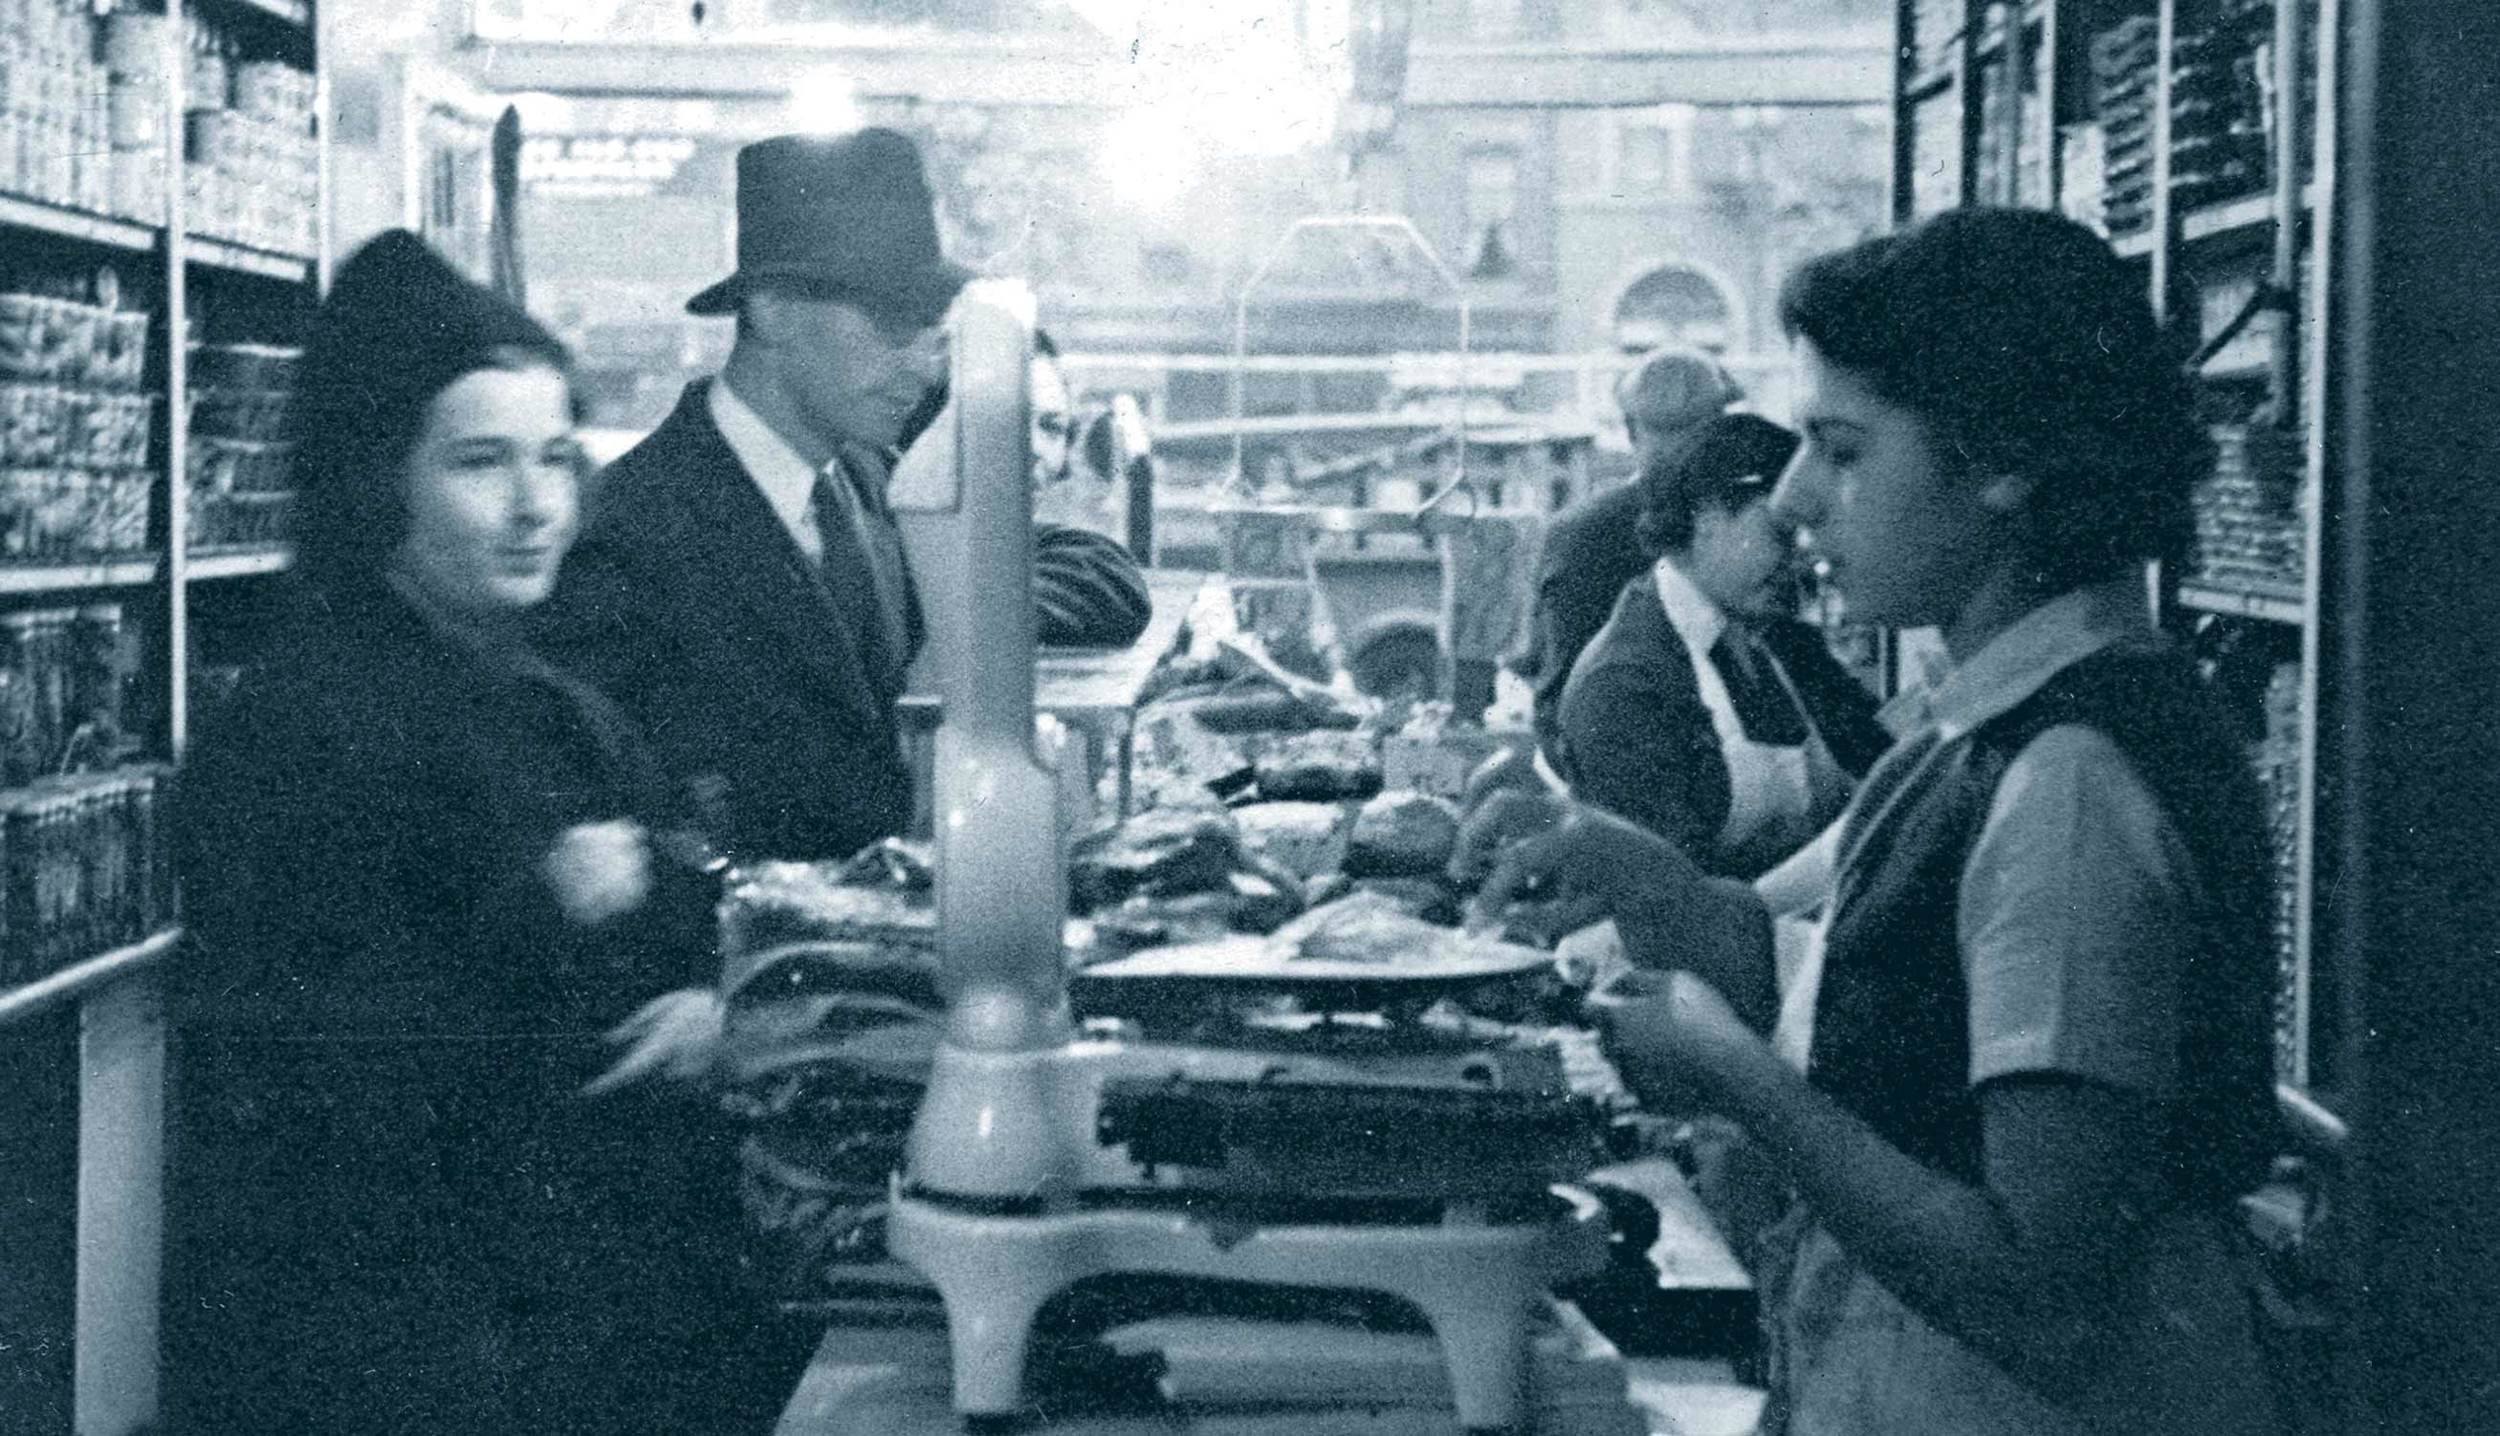 Russ & Daughters historic shop interior 1930s